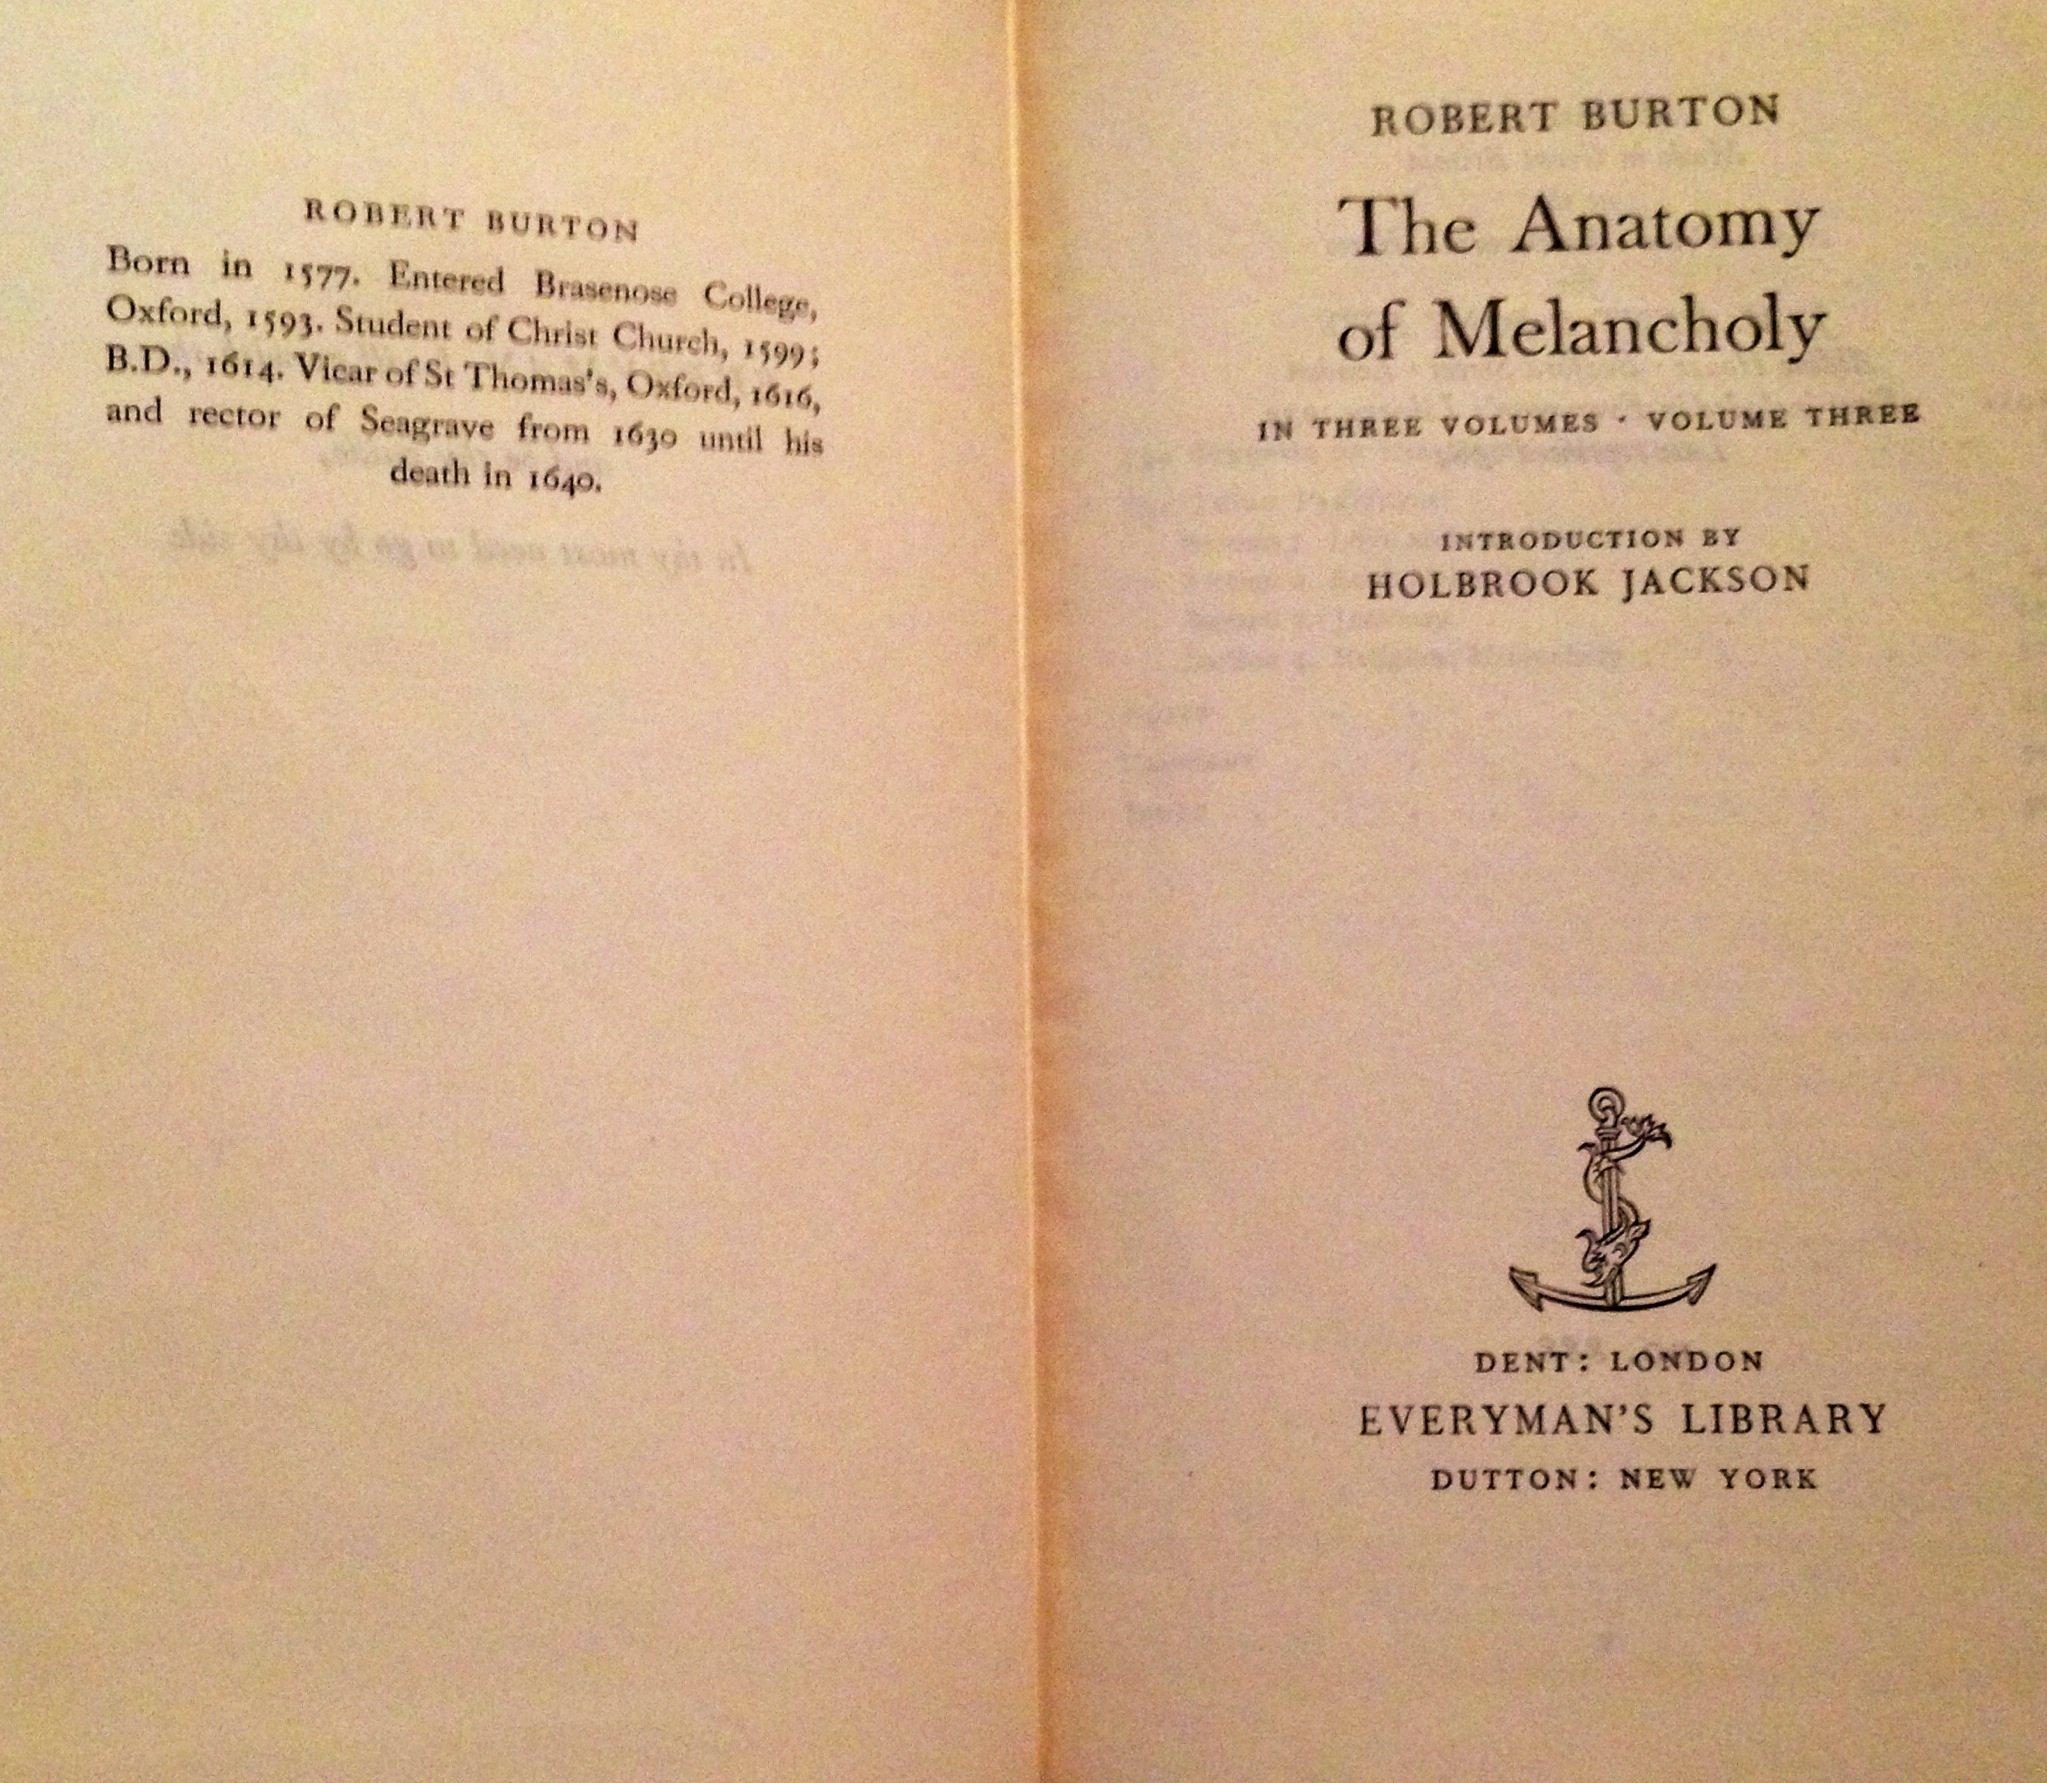 The Anatomy Of Melancholy 3 Volumes Robert Burton Amazon Books